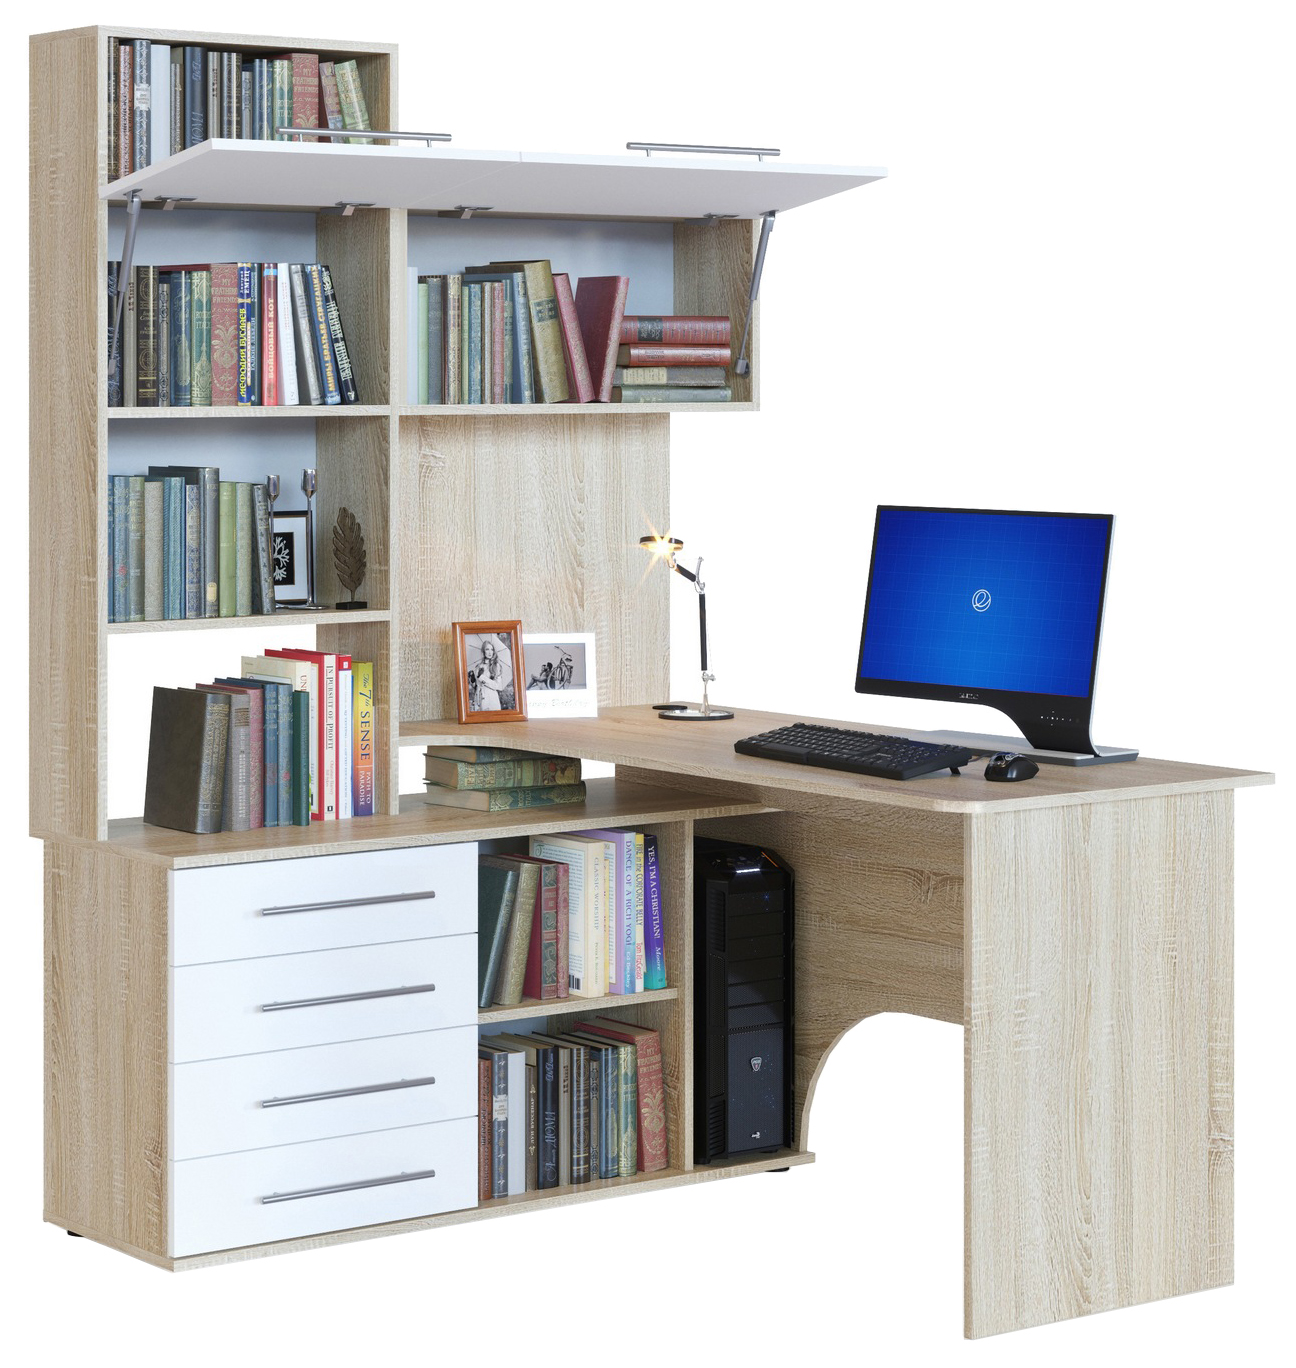 Компьютерный стол СОКОЛ КСТ-14П 140x123,5x182,8, дуб сонома/белый